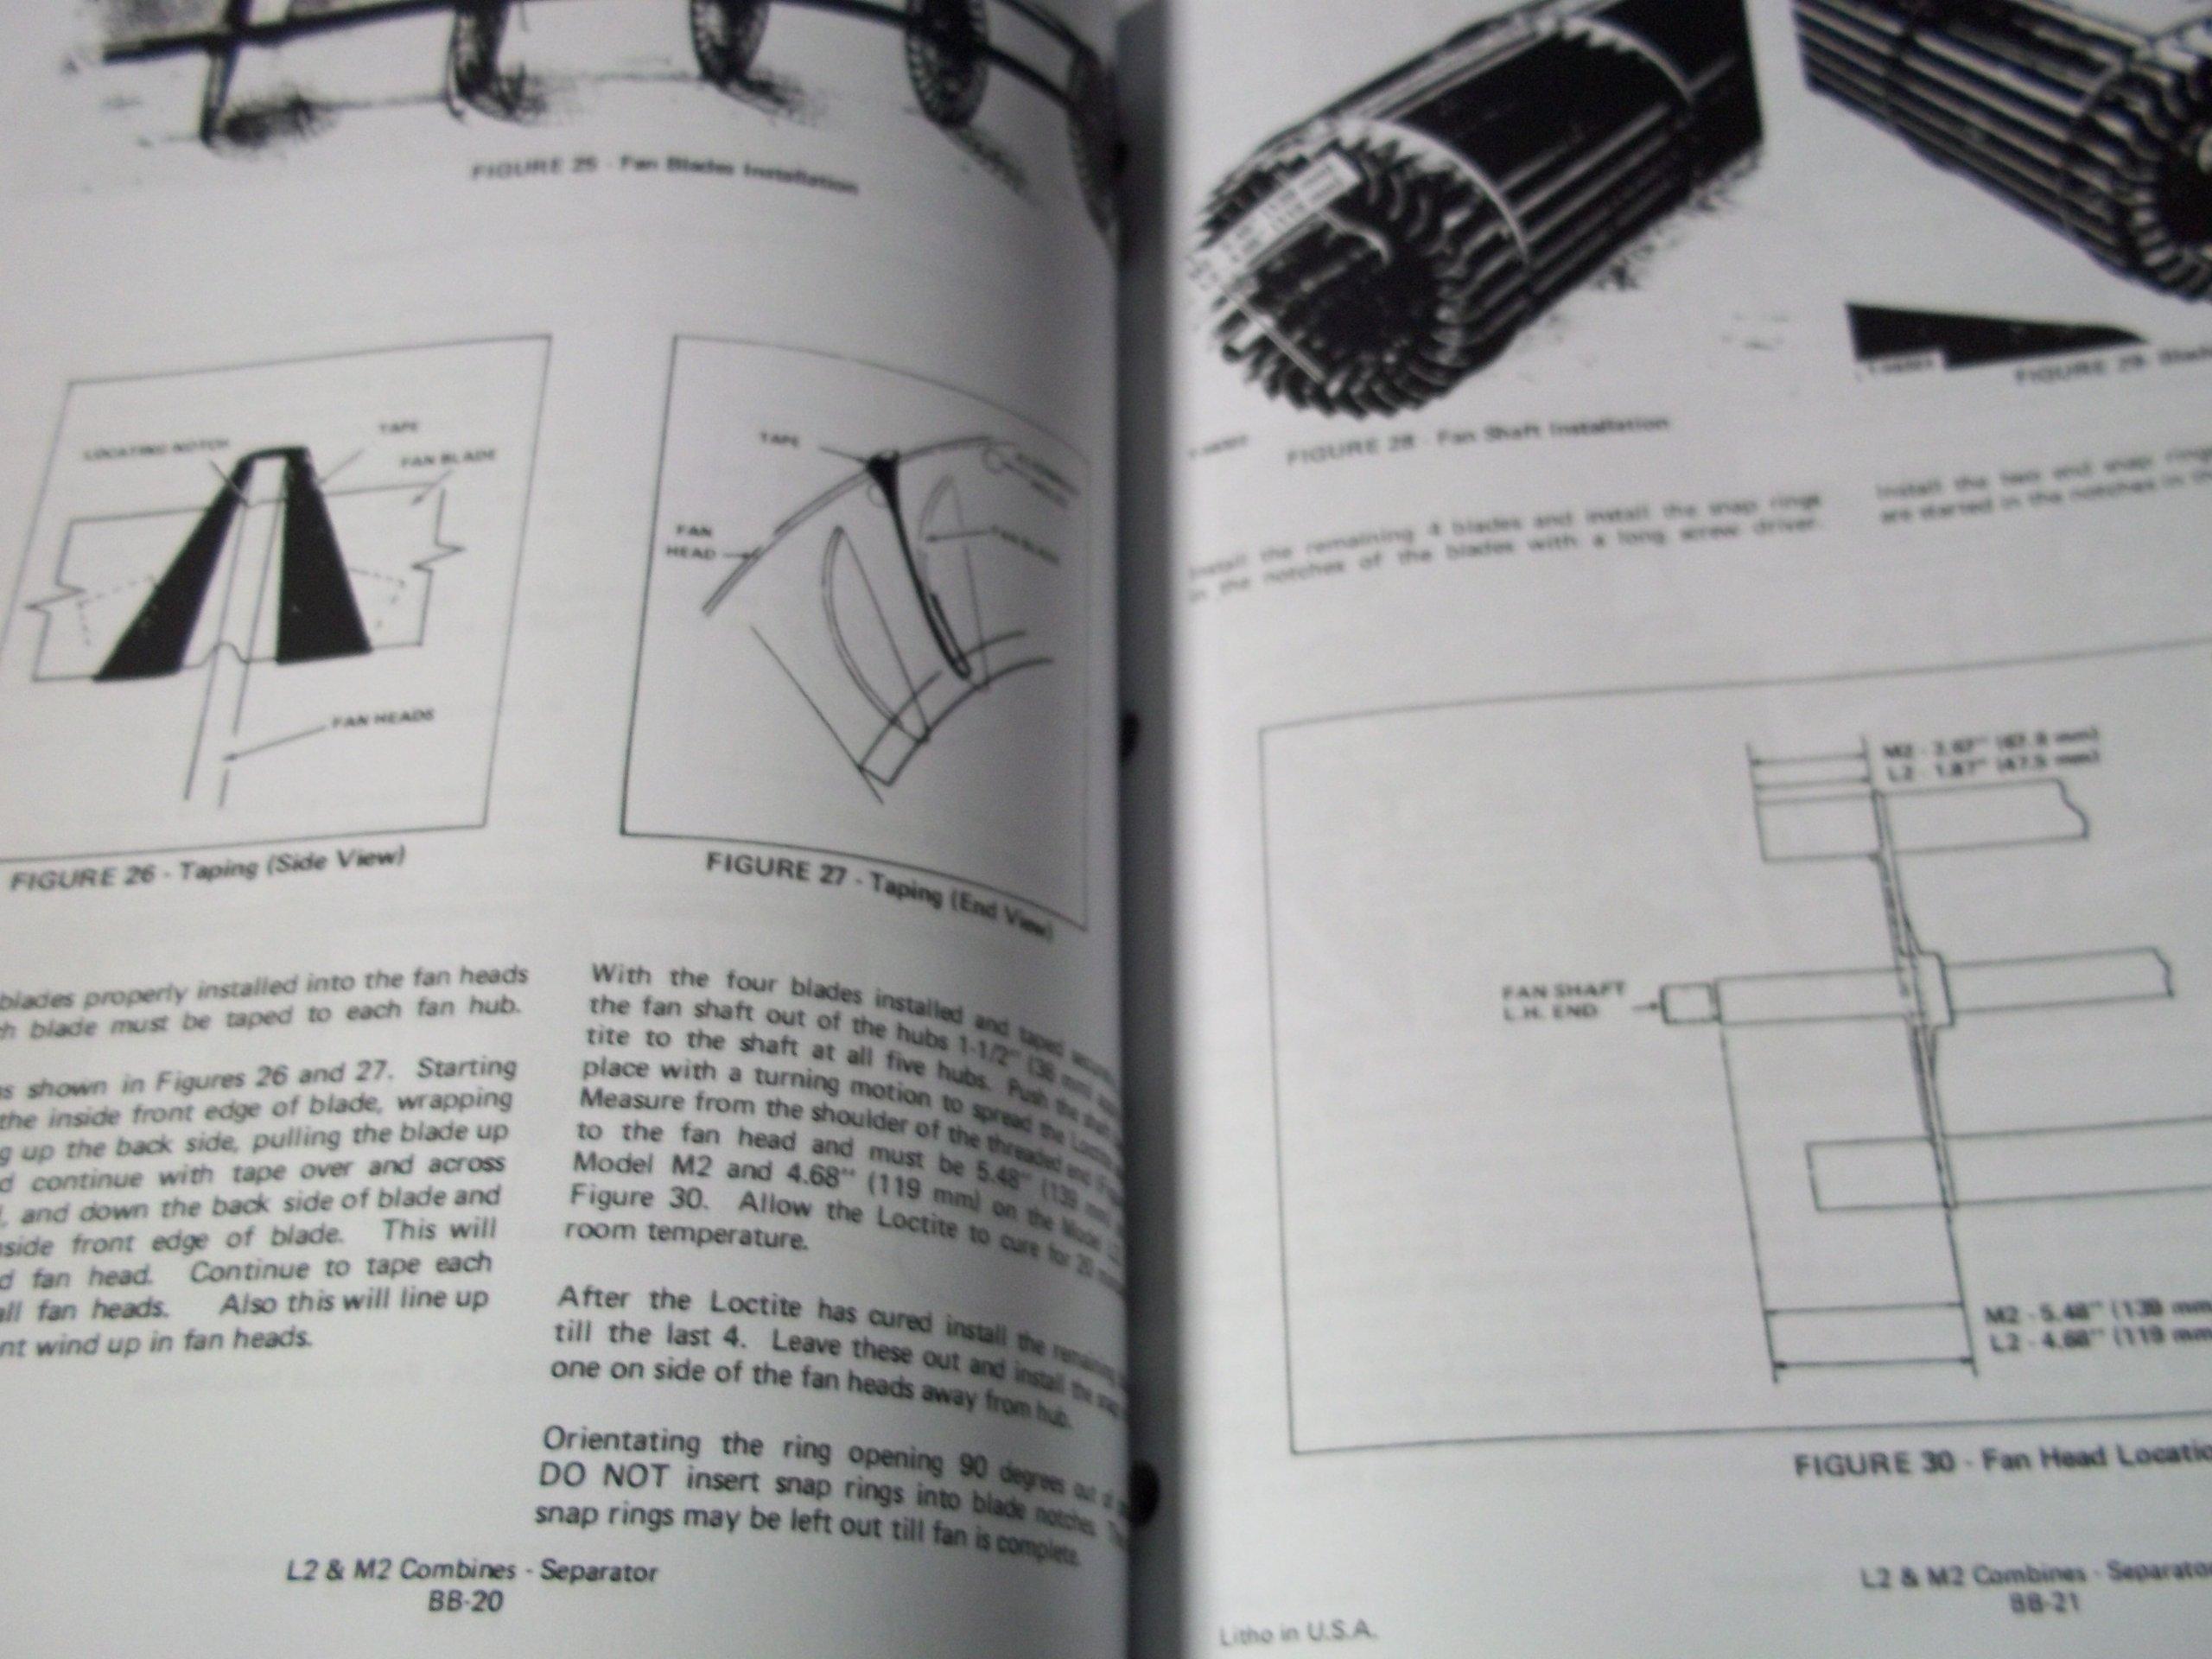 Deutz Allis L2 & M2 Gleaner Combine Service Manual: Deutz Allis:  Amazon.com: Books